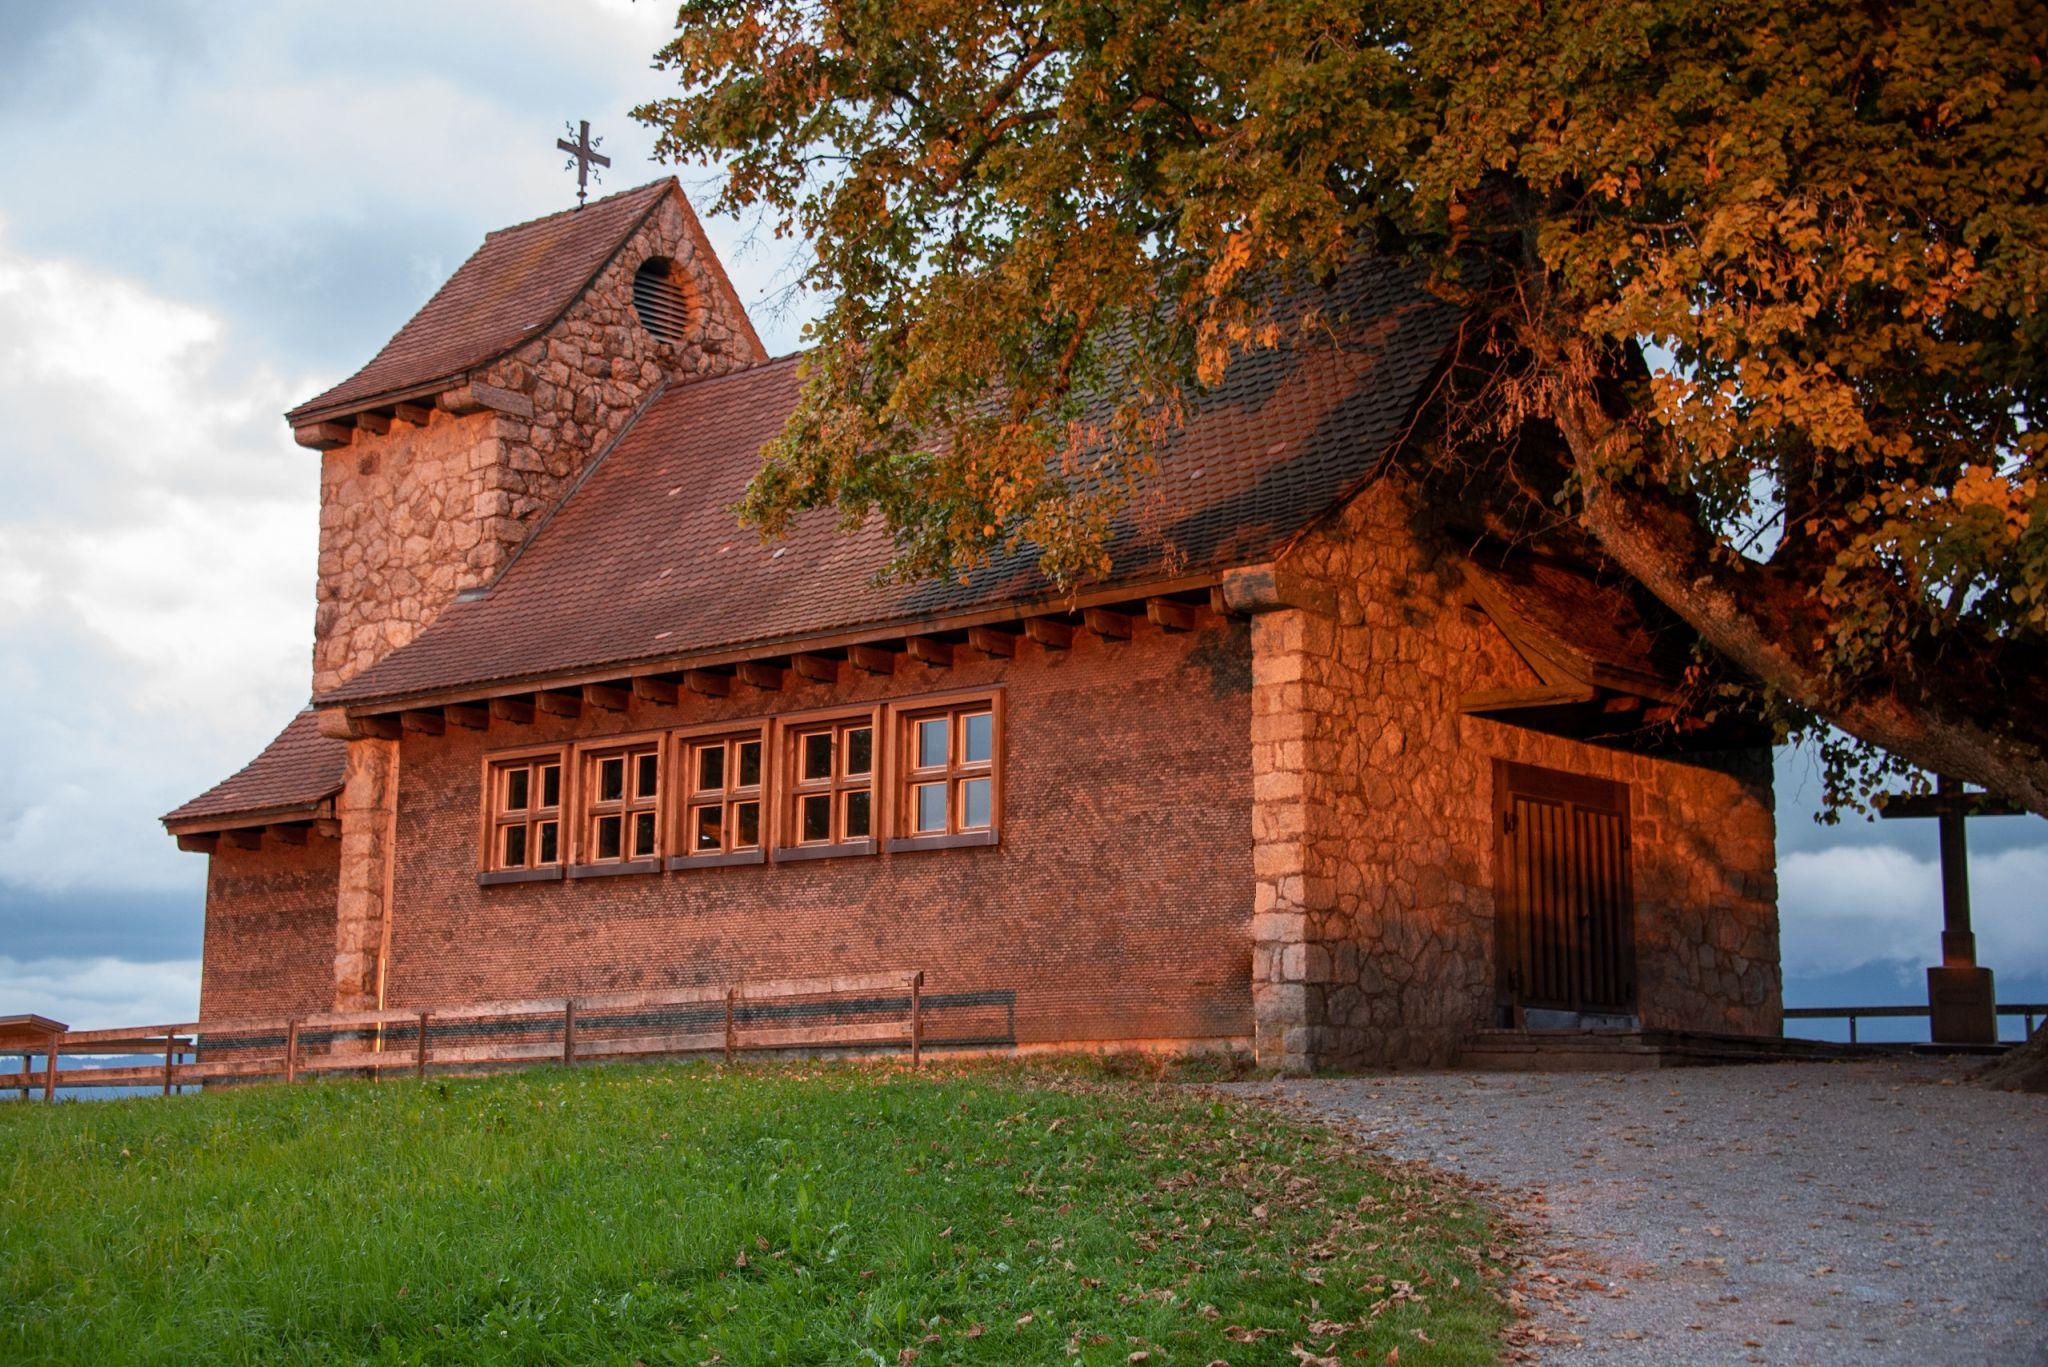 Kapelle Michaelskreuz, Switzerland